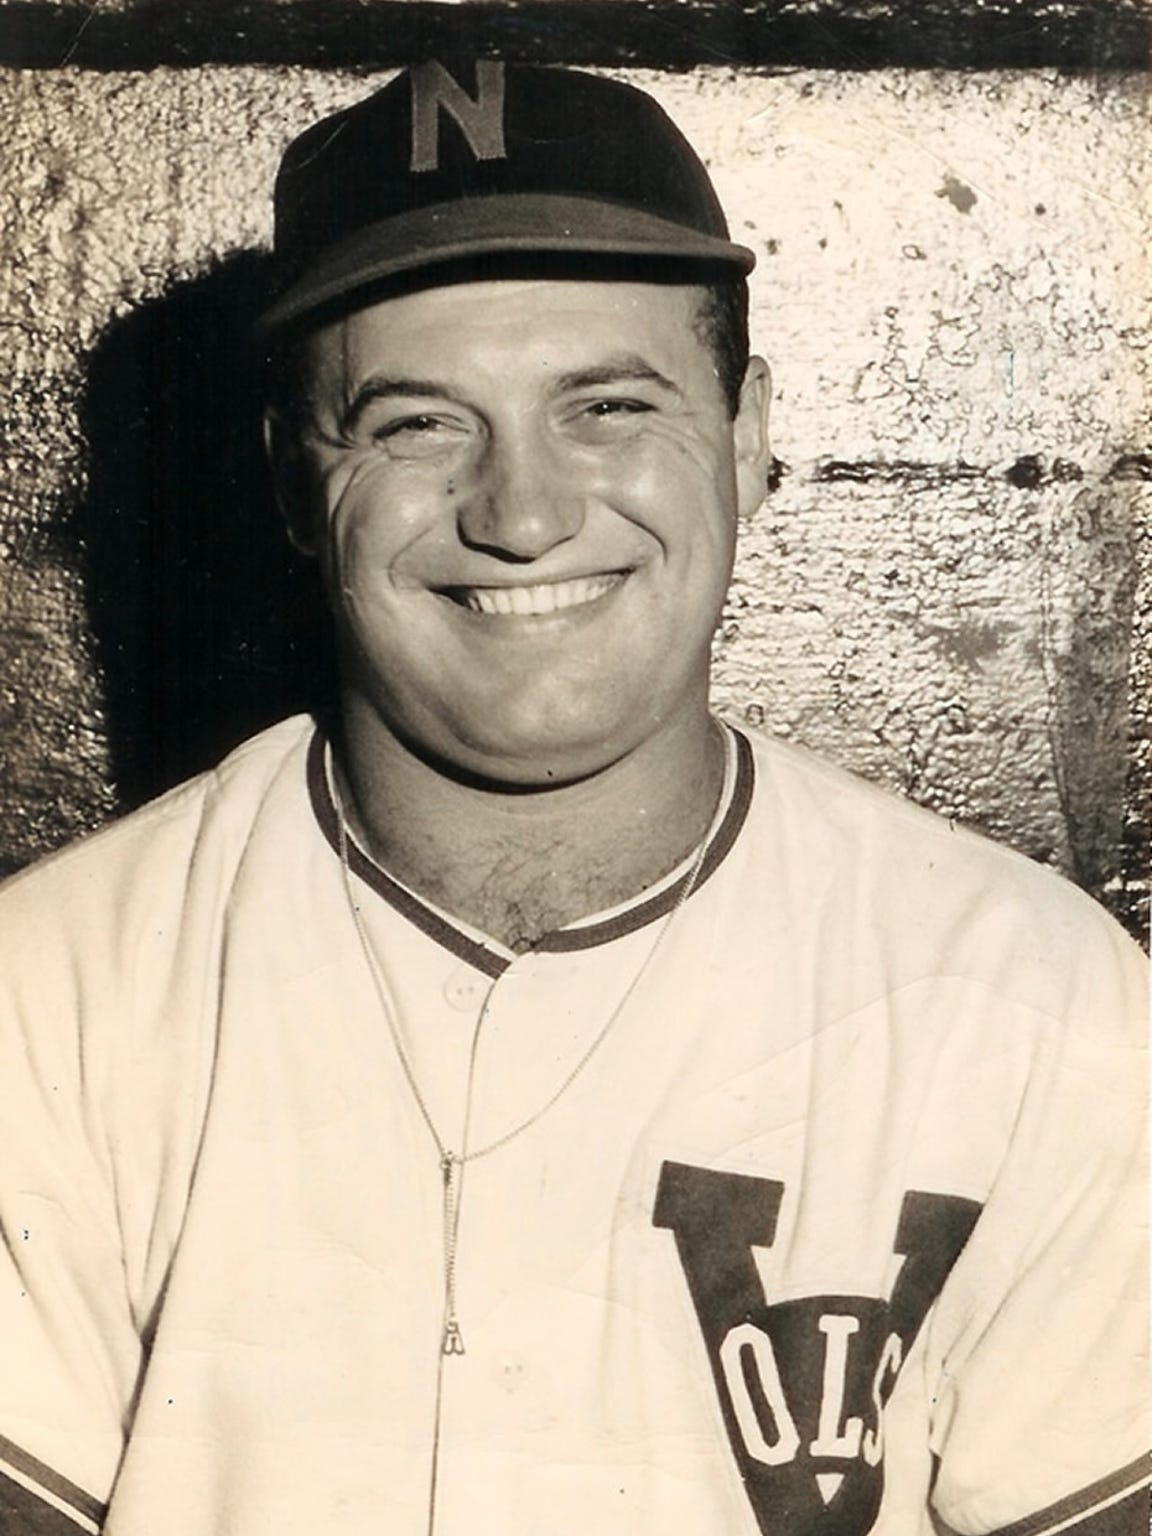 Carl Sawatski played for the 1949-50 Nashville Vols.